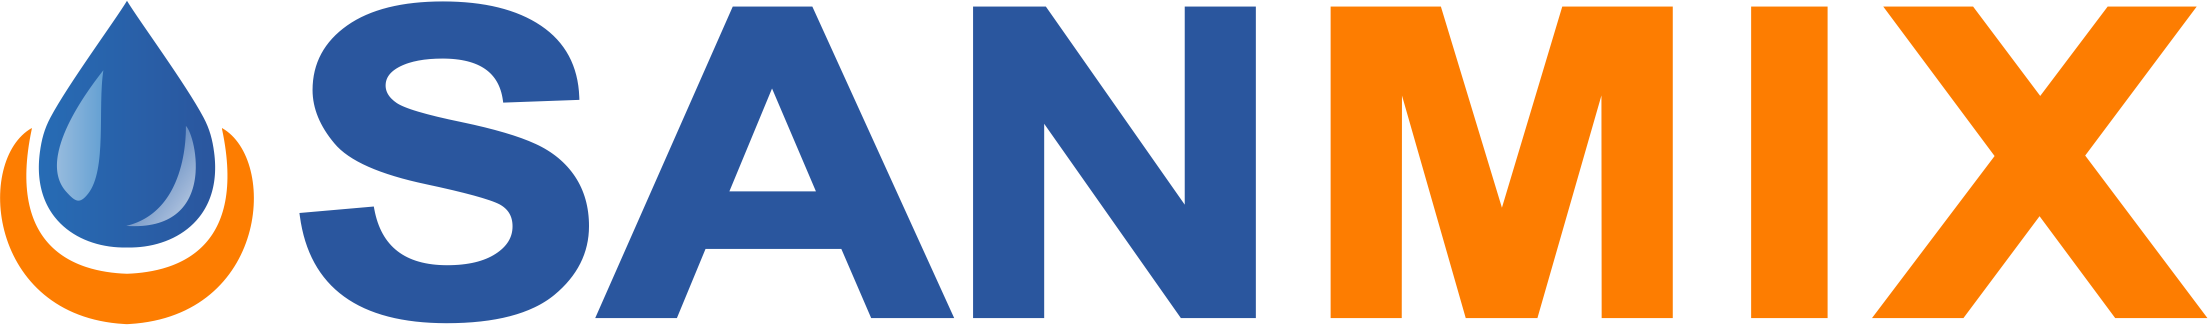 Интернет-магазин Санмикс